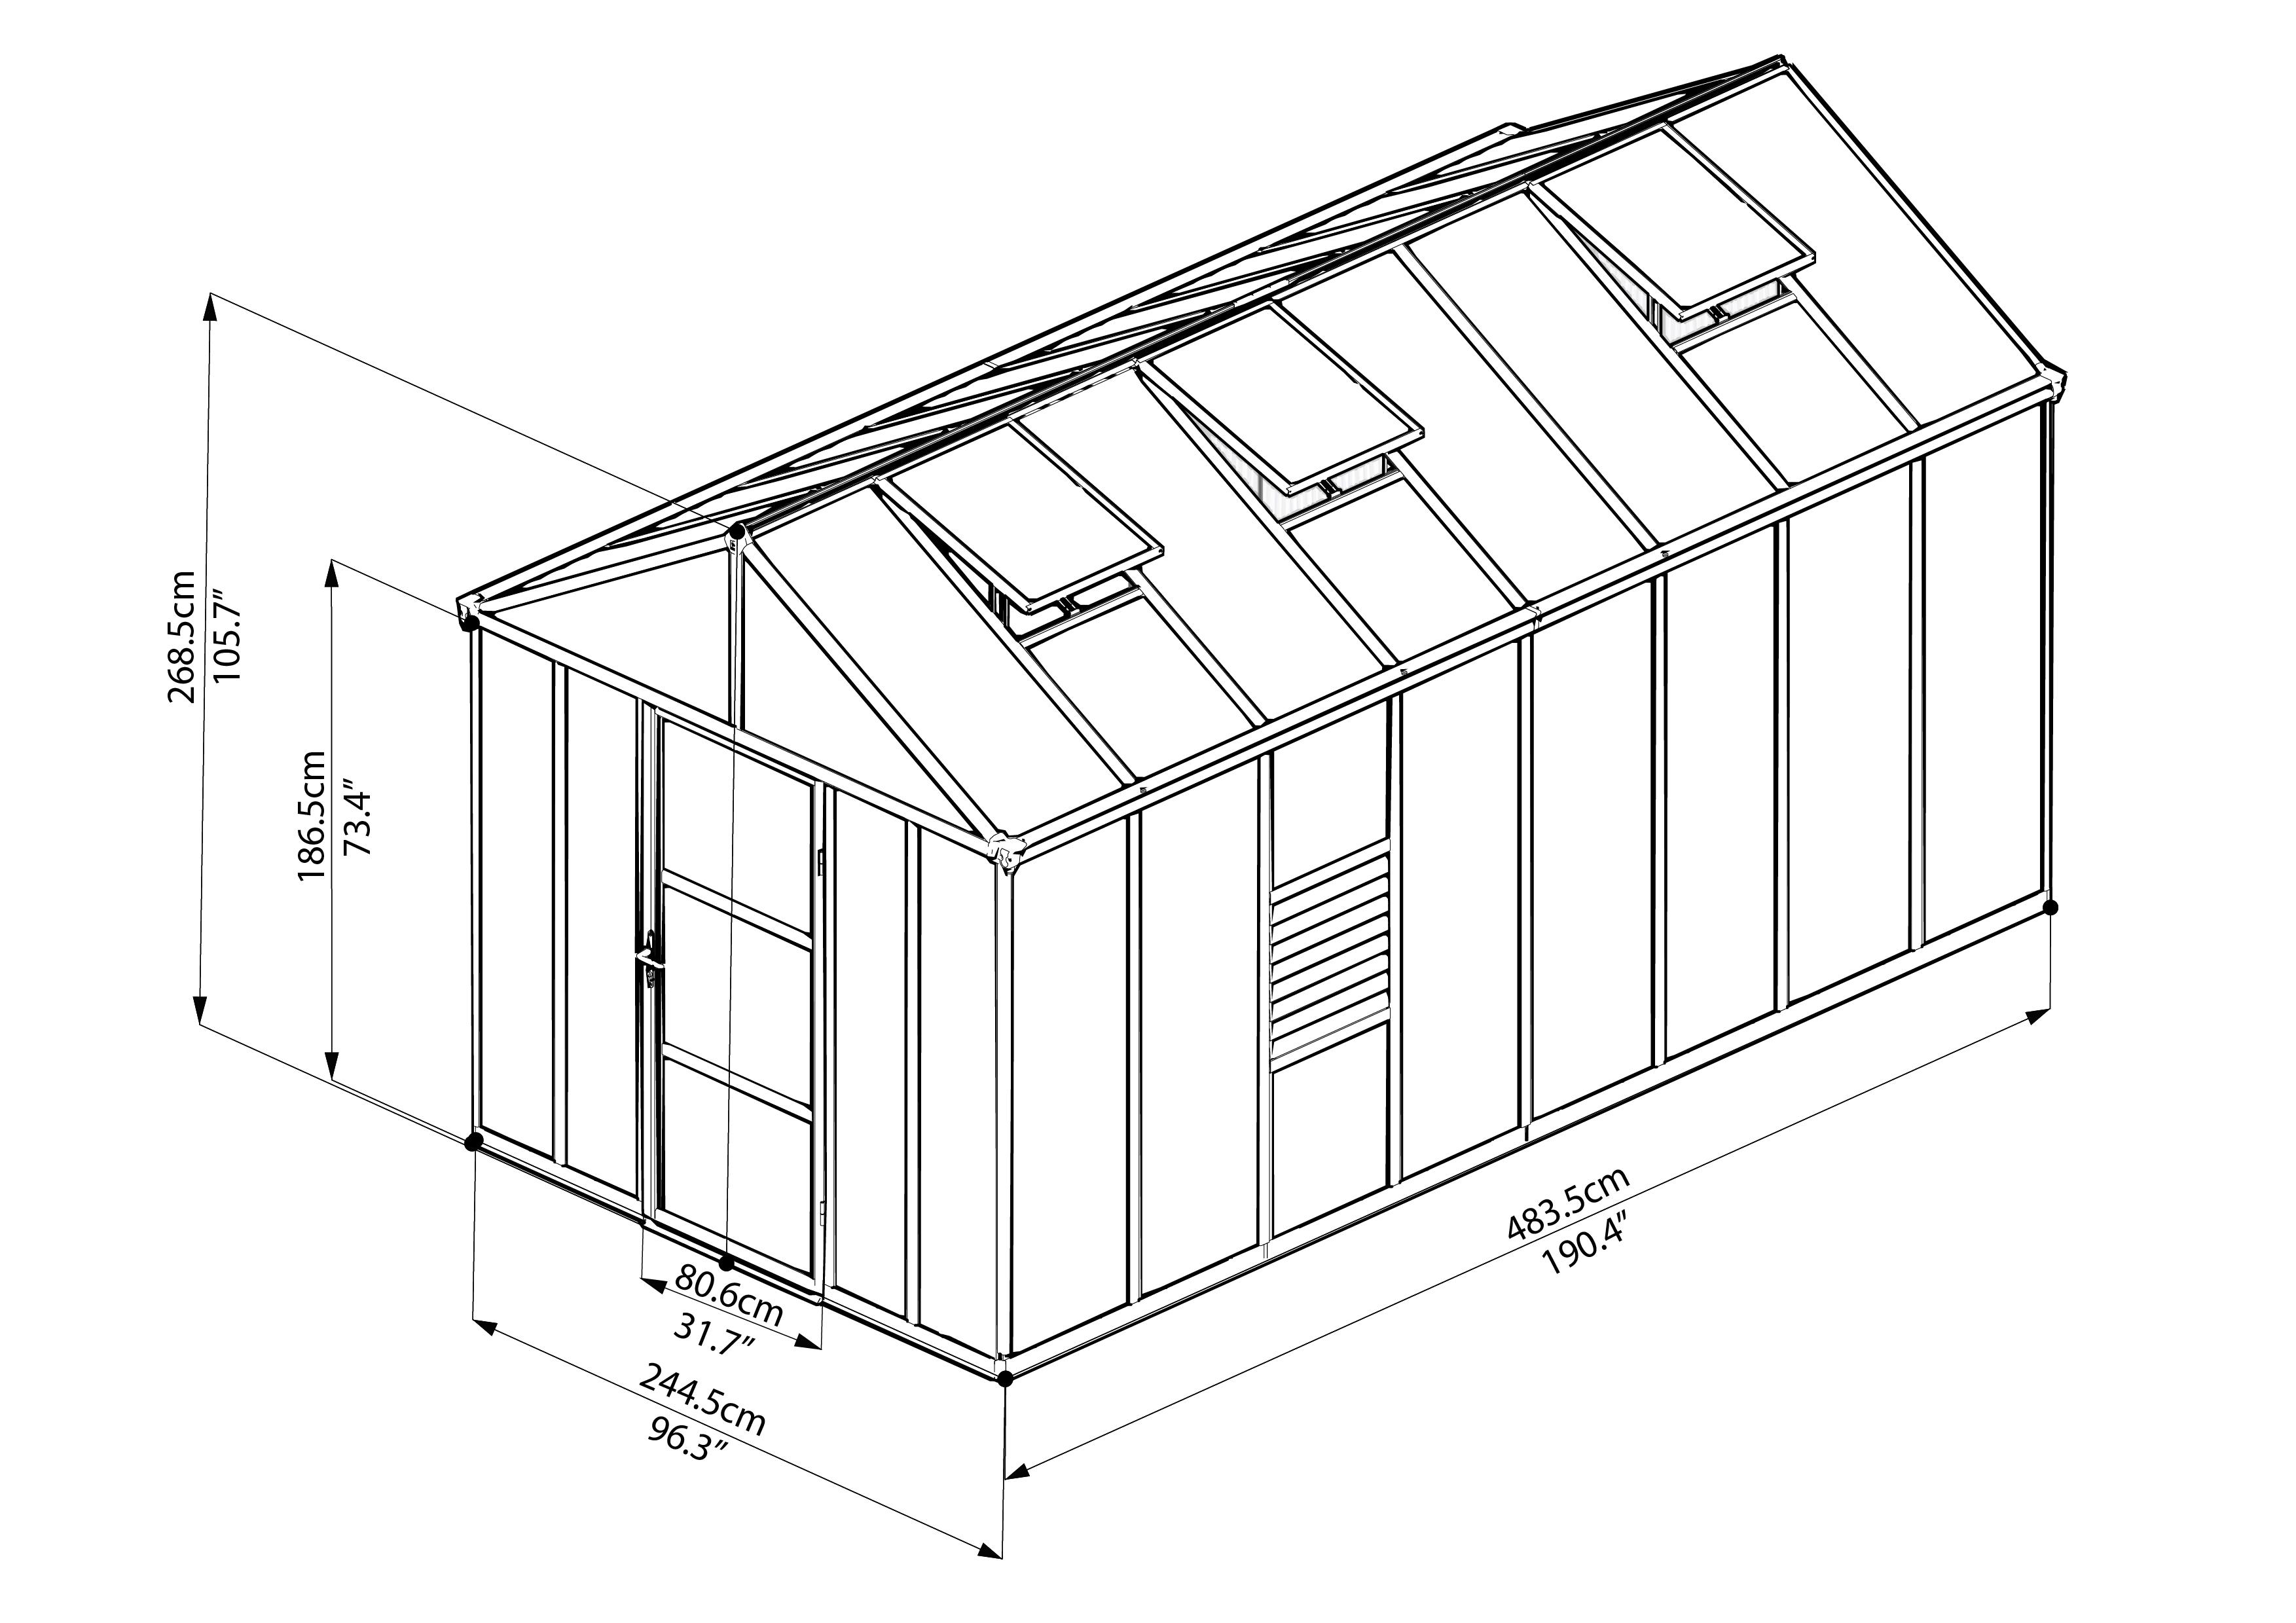 palram-greenhouses-glory-8x16-drawing-isoview.jpg